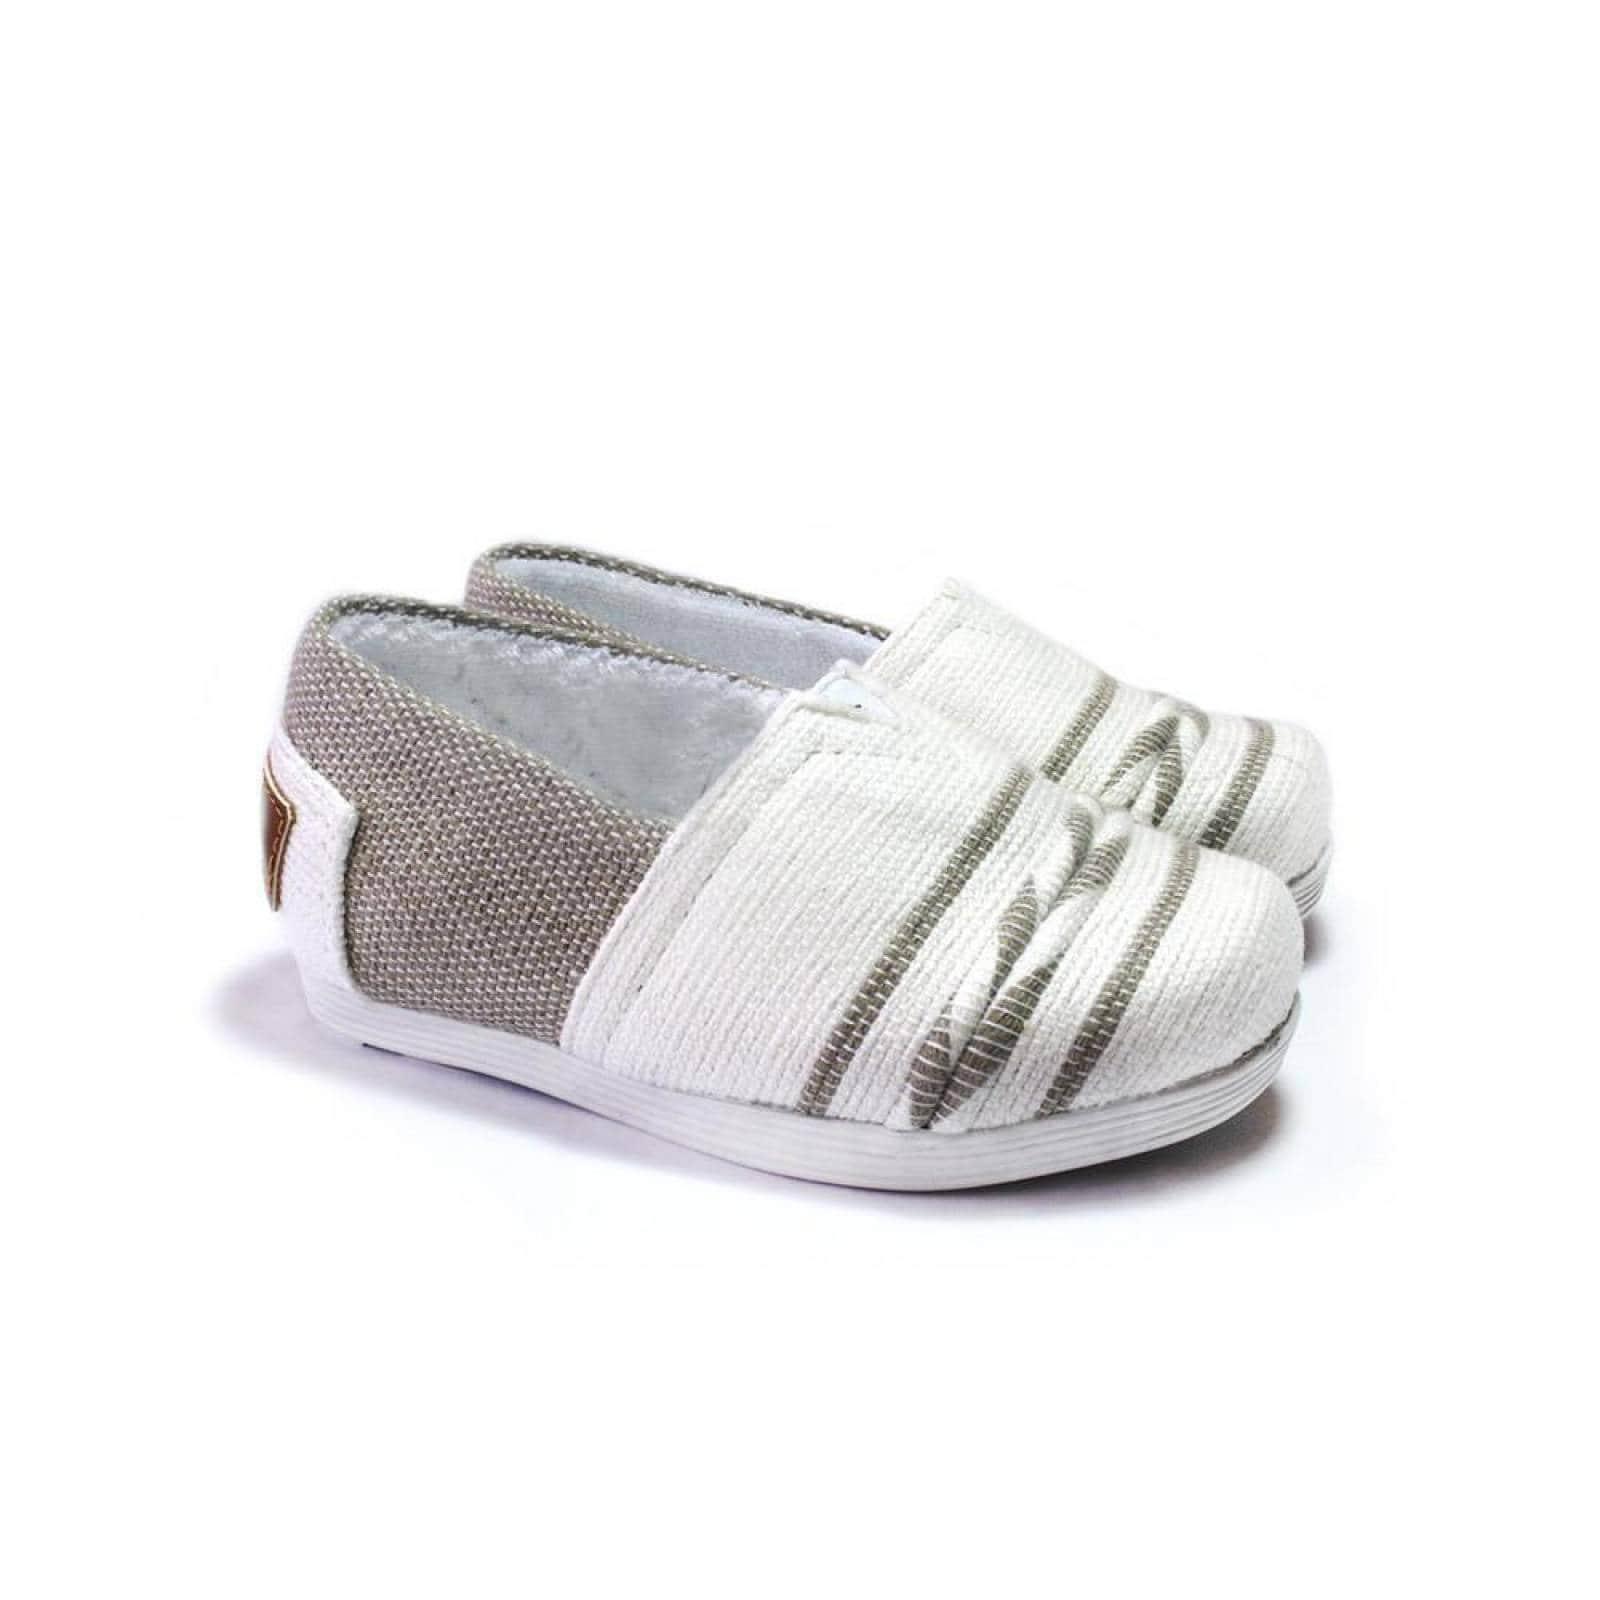 Zapato Alpargata Mini Jacinta Artesanal Tela Infantil Beige Komoni Talla: 16